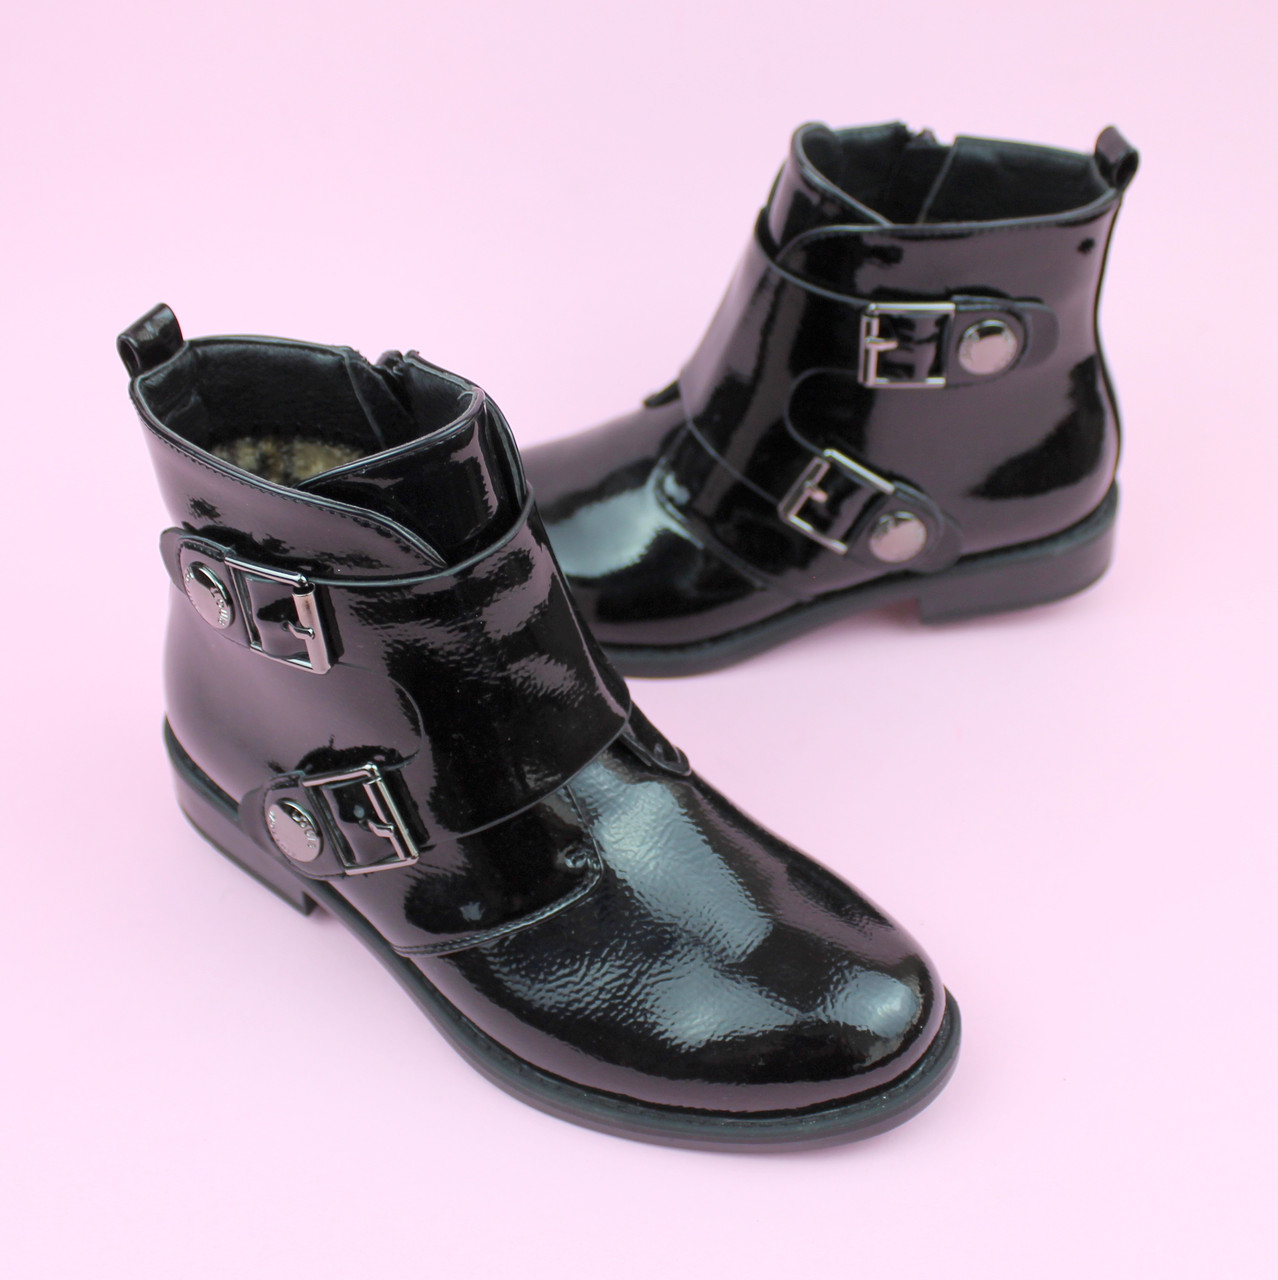 Ботинки демисезонные на девочку розовые тм Bi&Ki размер 37,38